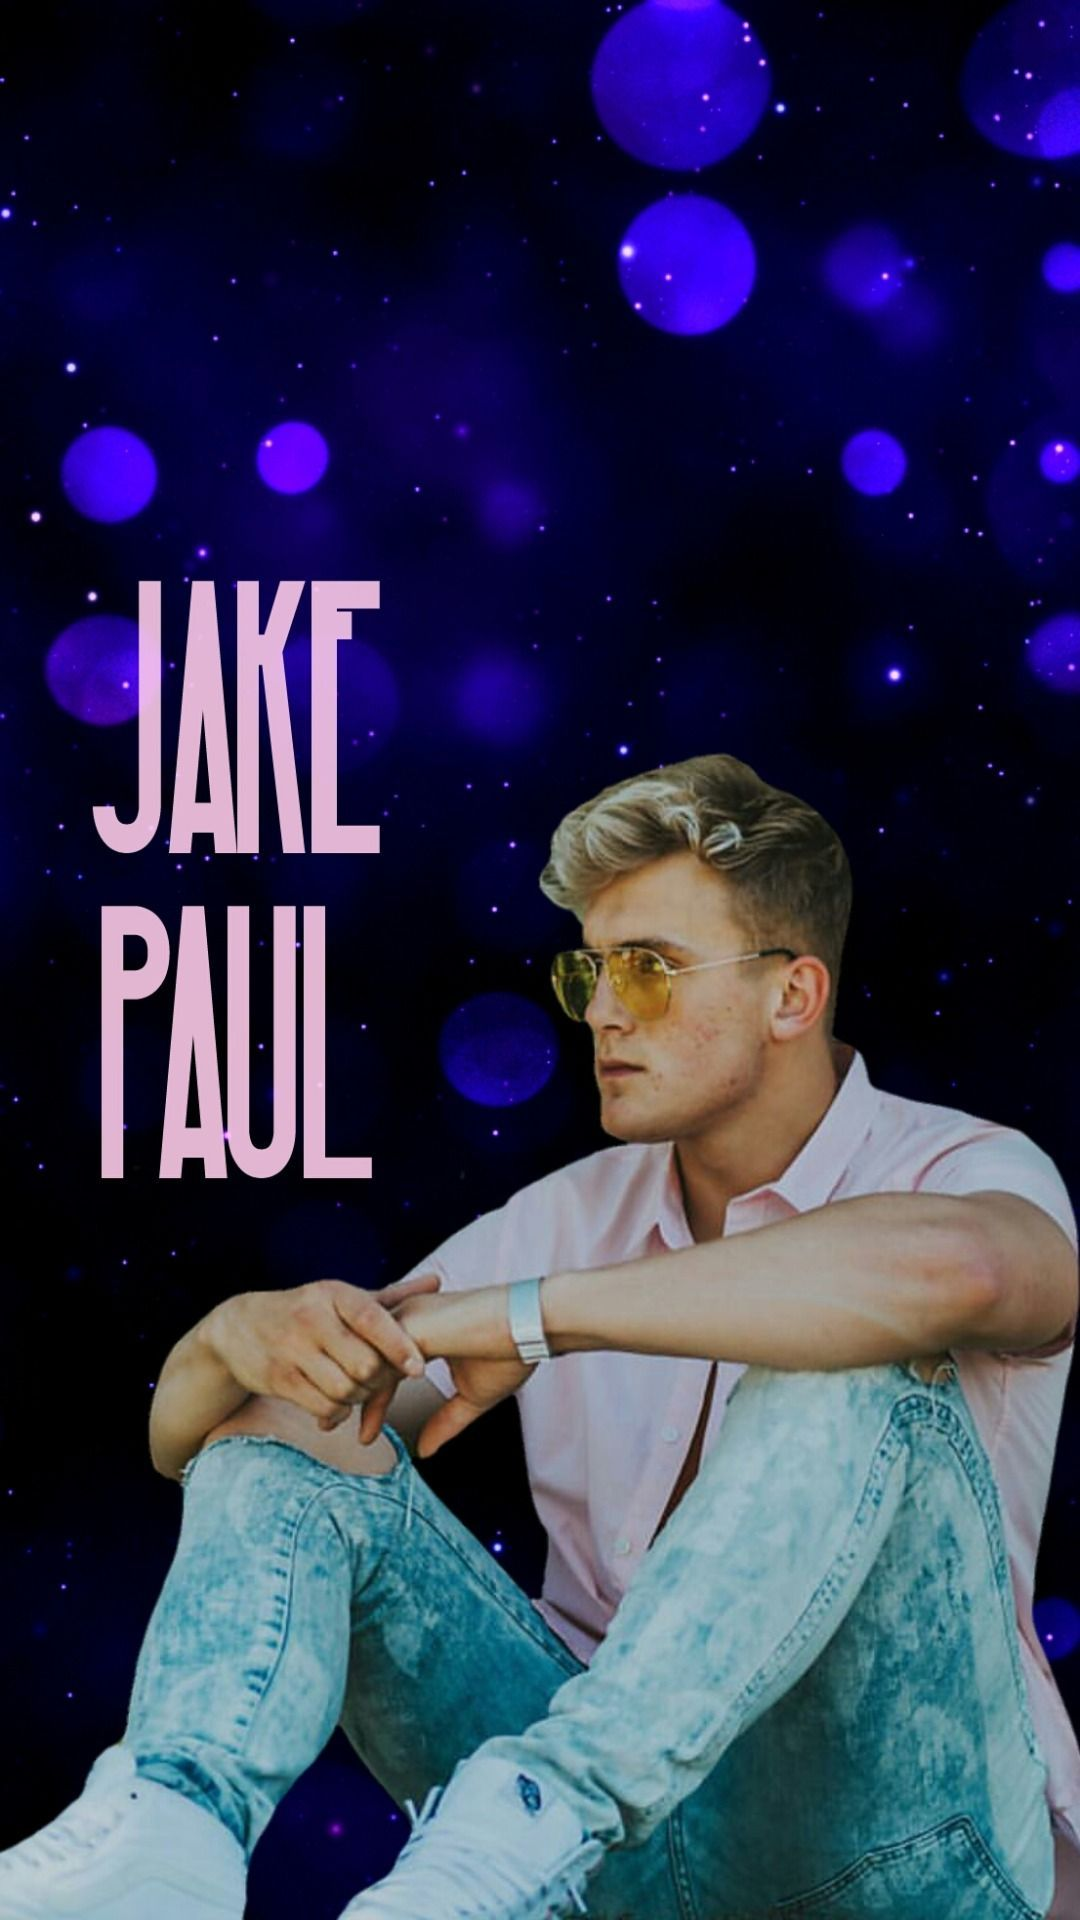 Jake Paul Wallpapers - Top Free Jake